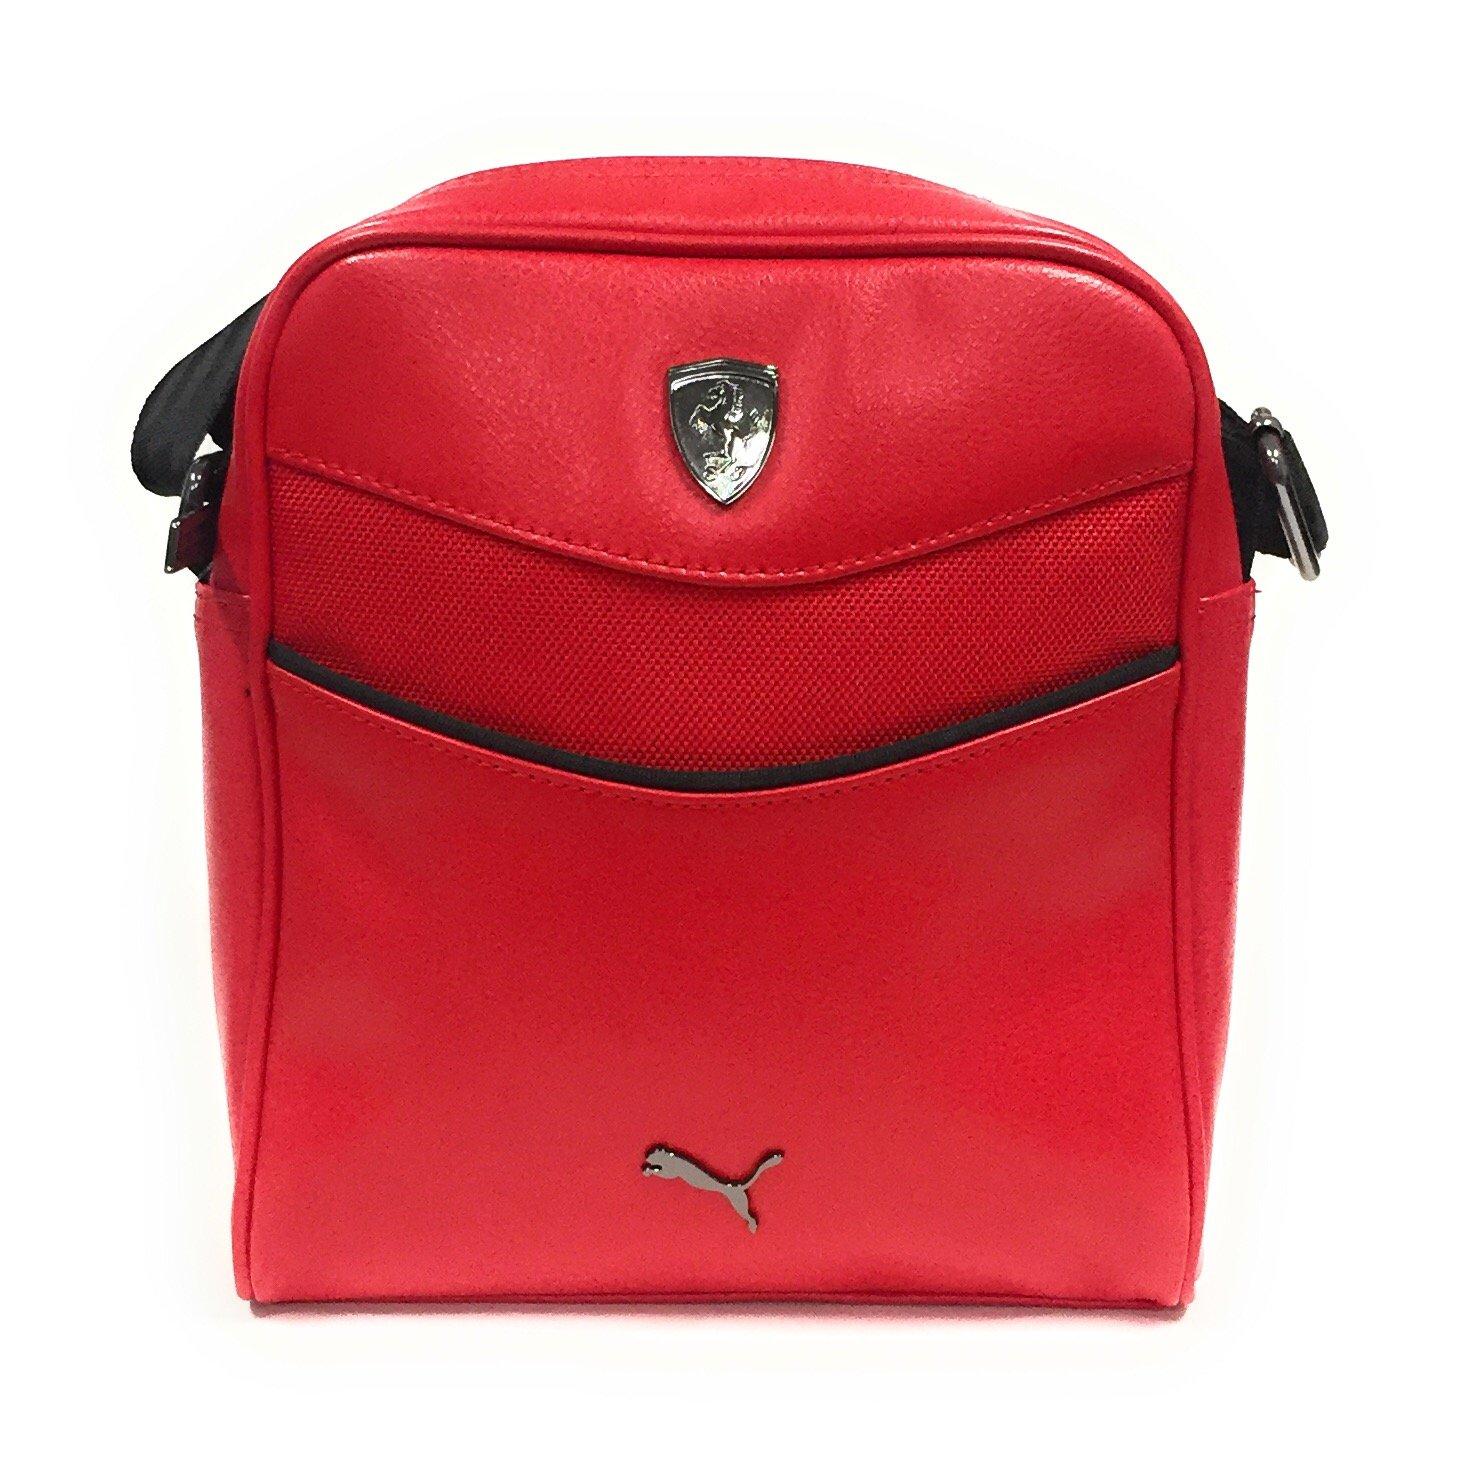 e1c53b9a1a Galleon - PUMA Ferrari LS Portable 073941,Red,US